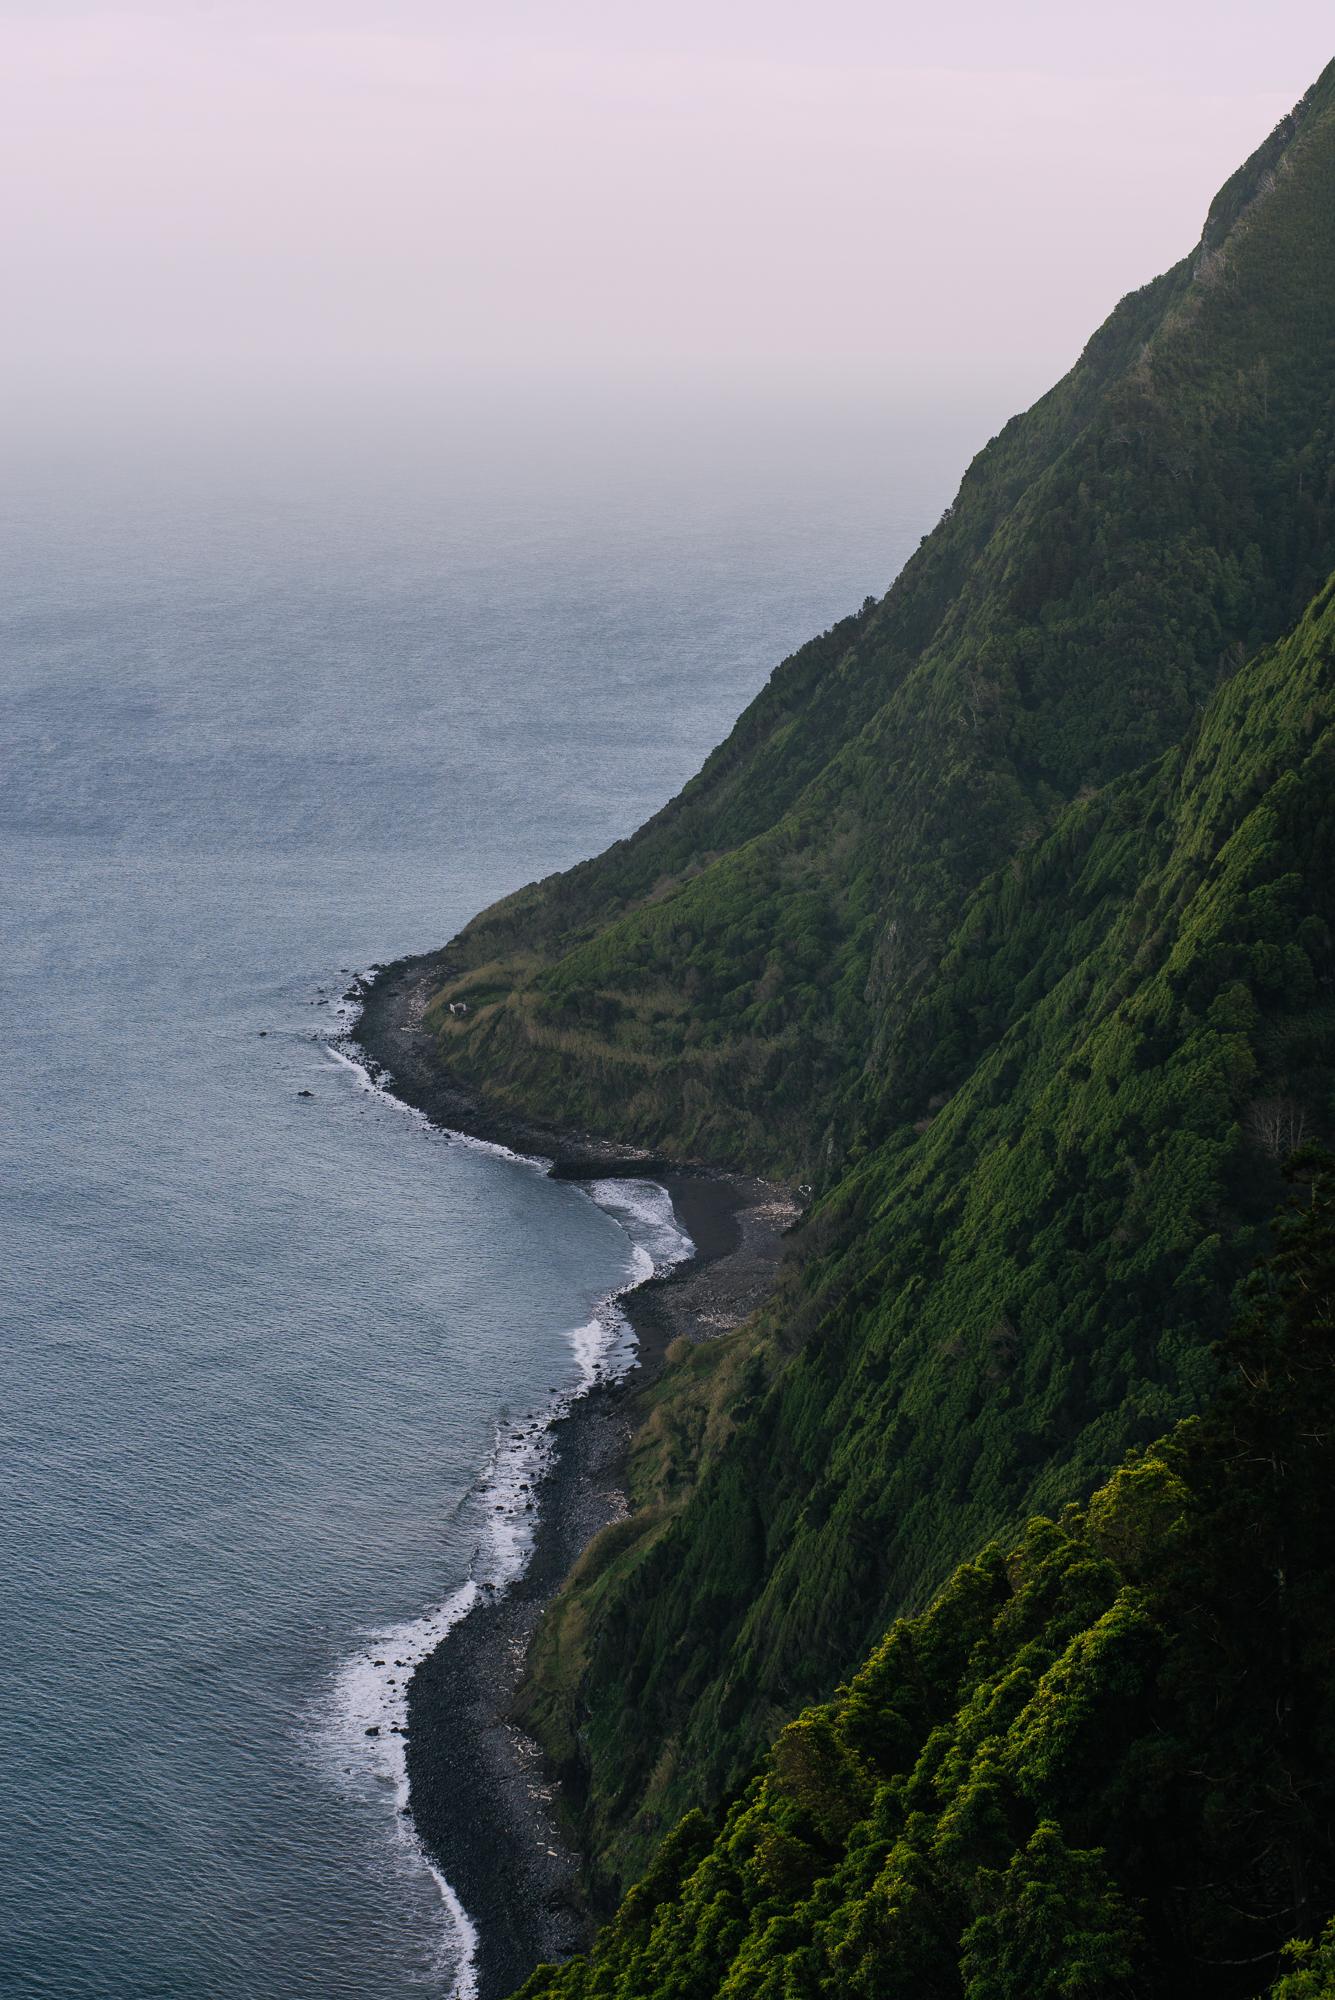 Ponta do Sossego